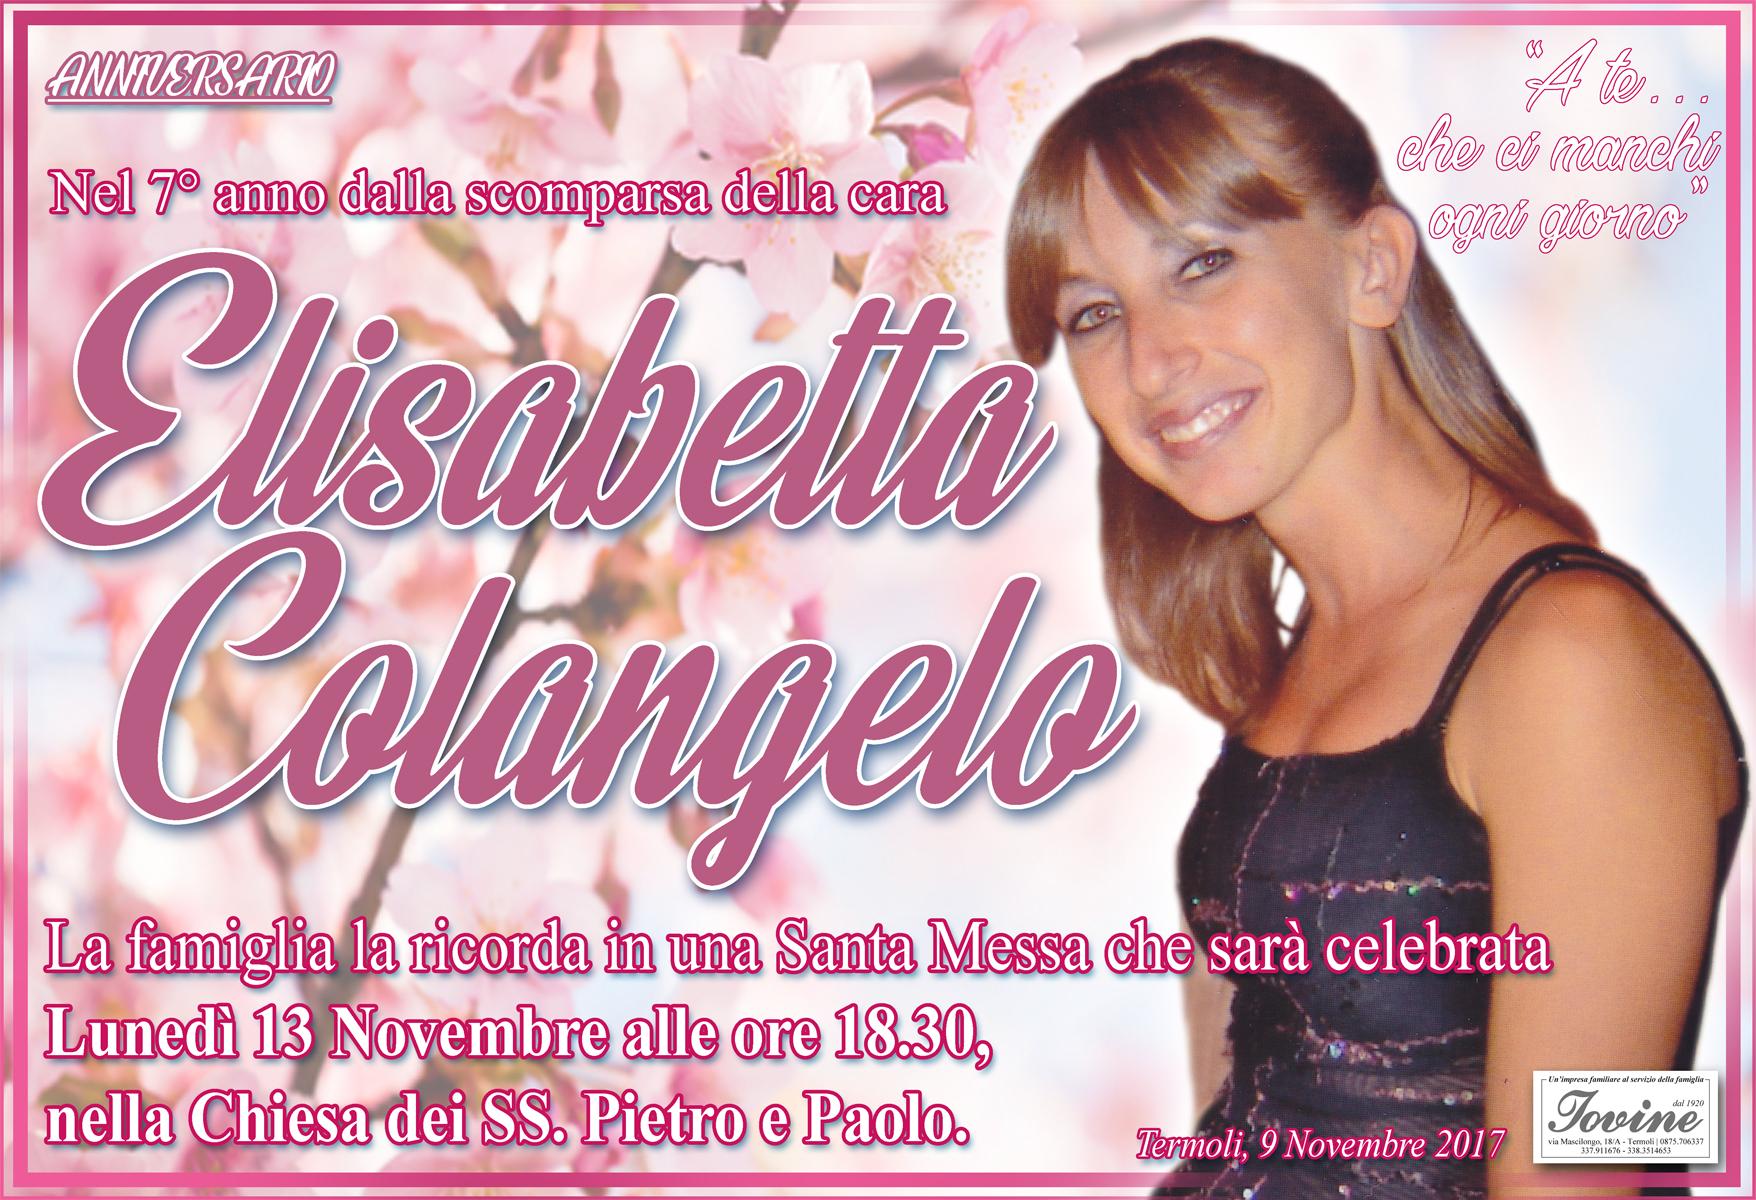 Elisabetta Colangelo – 08/11/2017 – Termoli – Onoranze Funebri Jovine